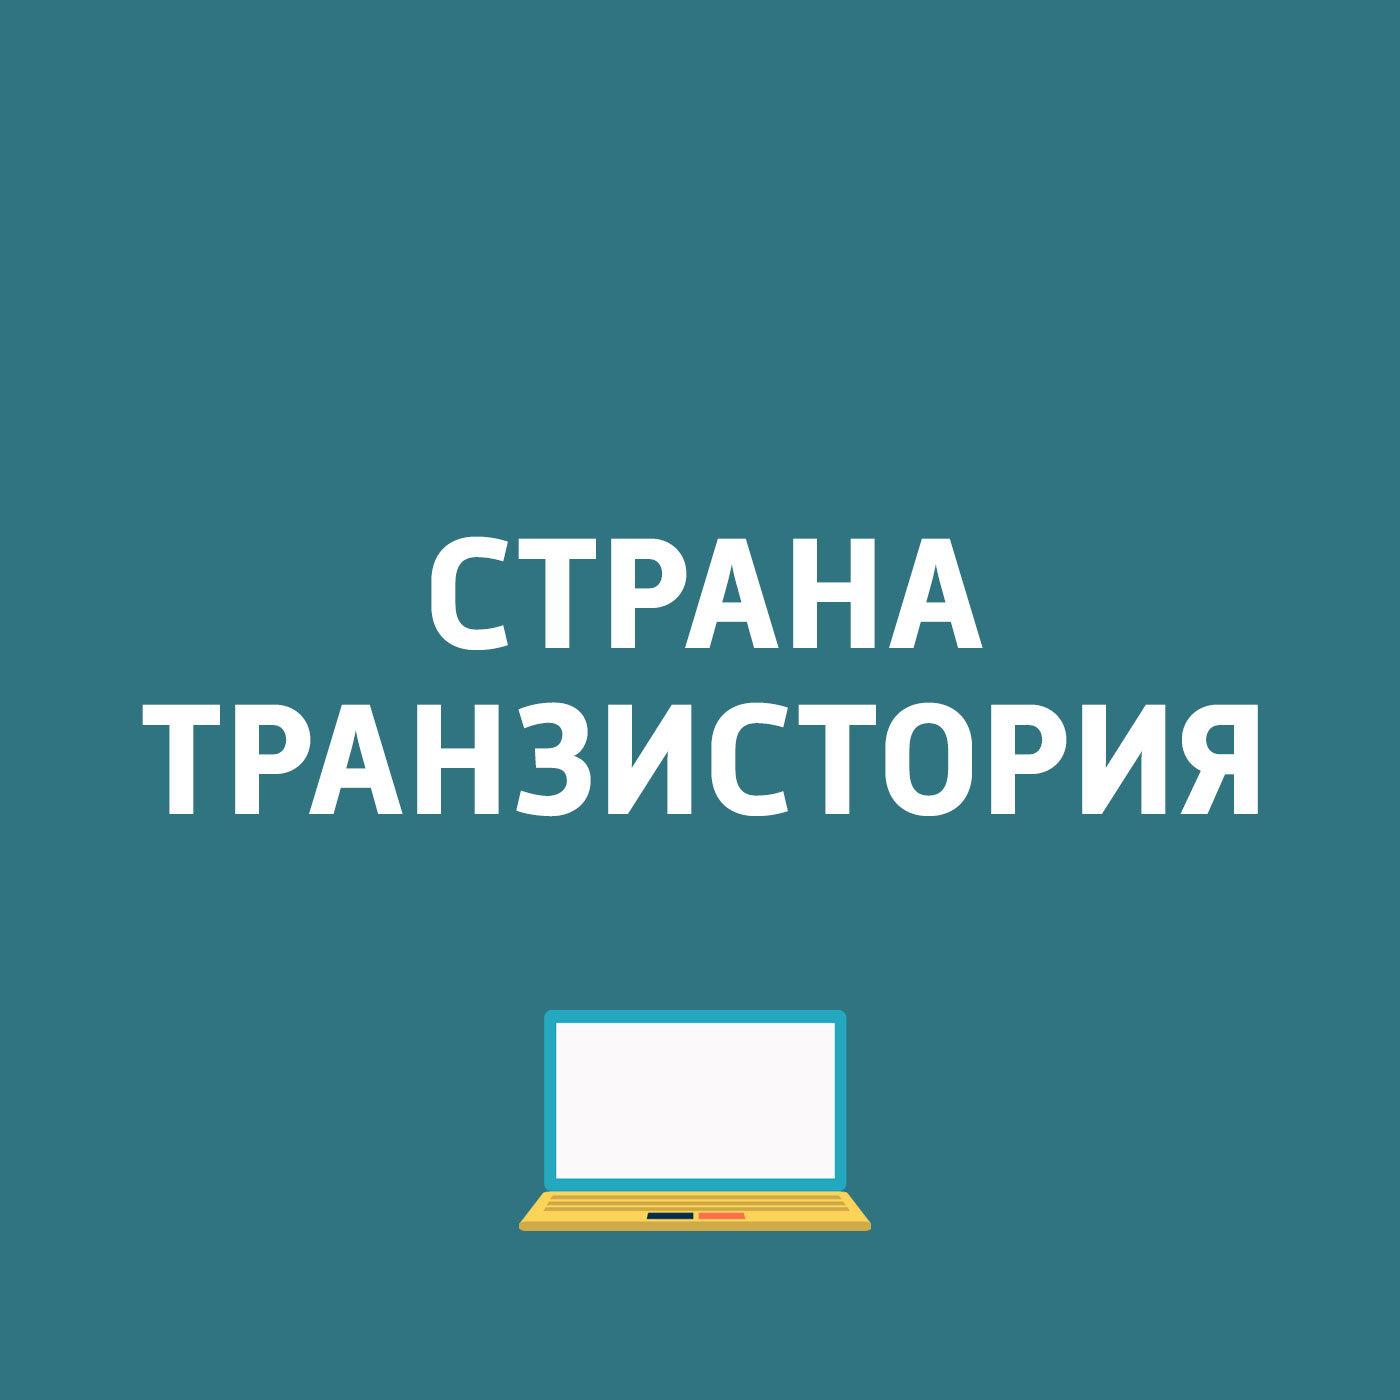 цены Картаев Павел Transmission с вирусом